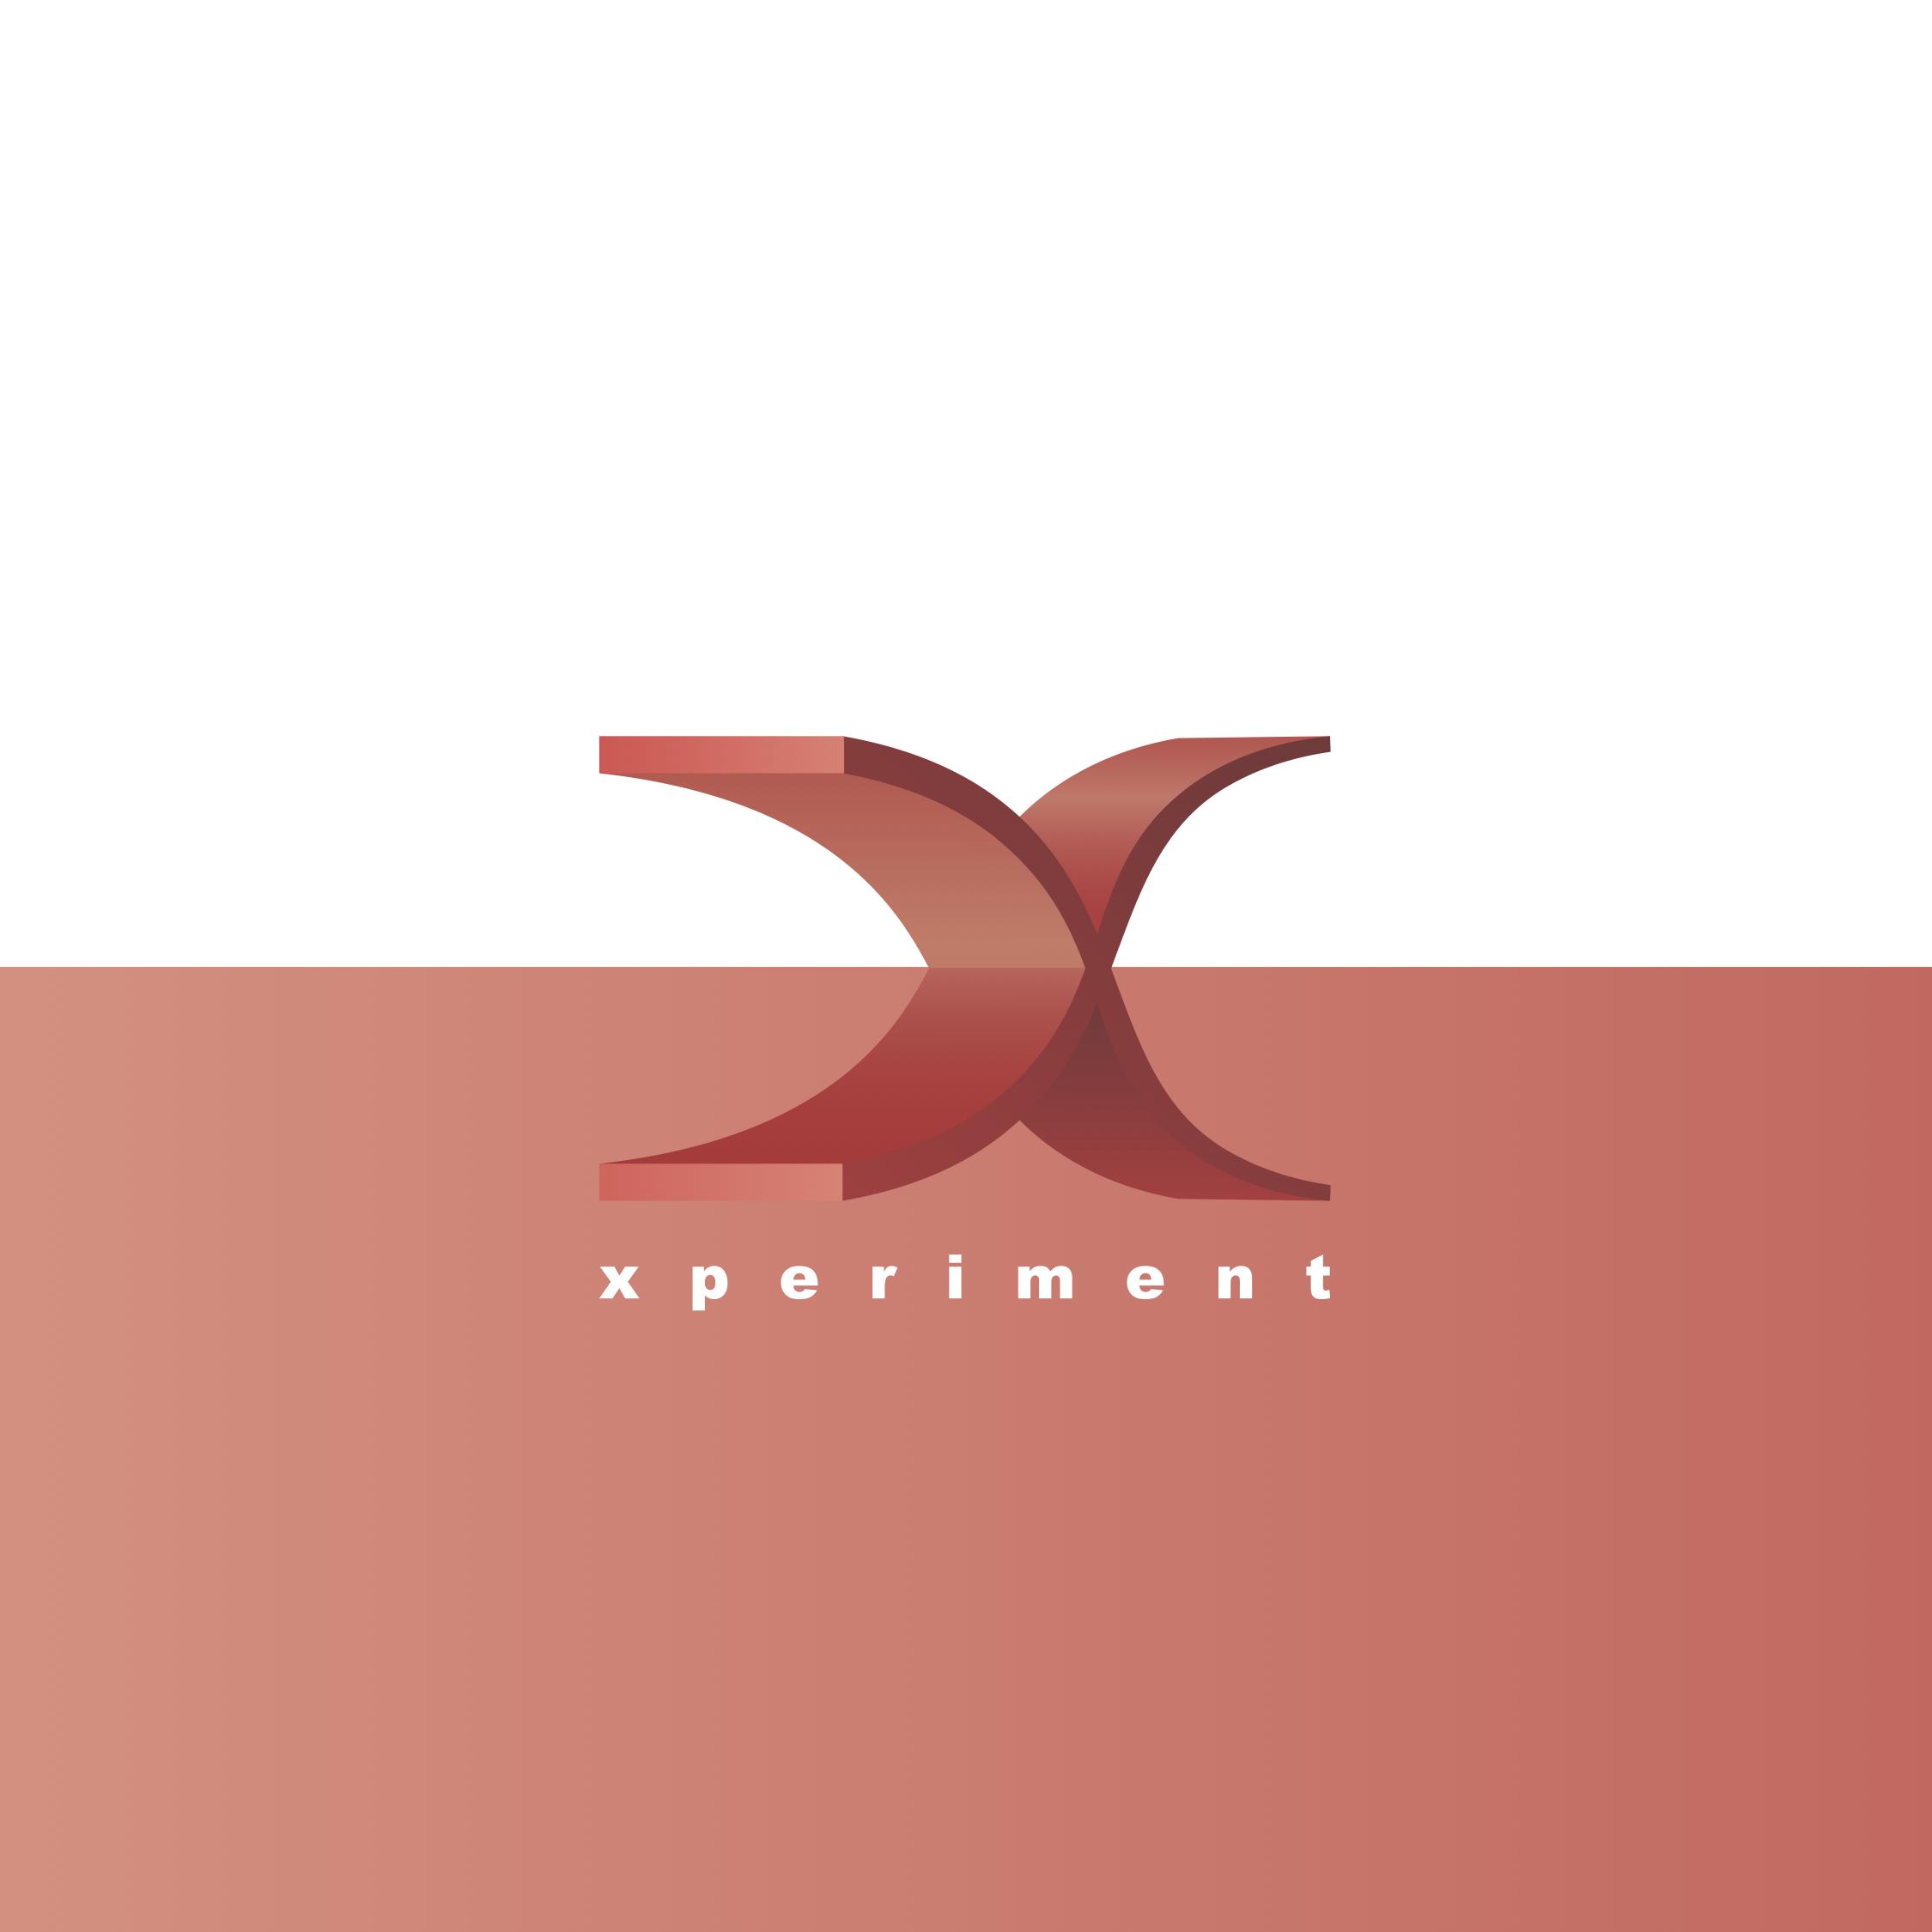 xperiment.jpg